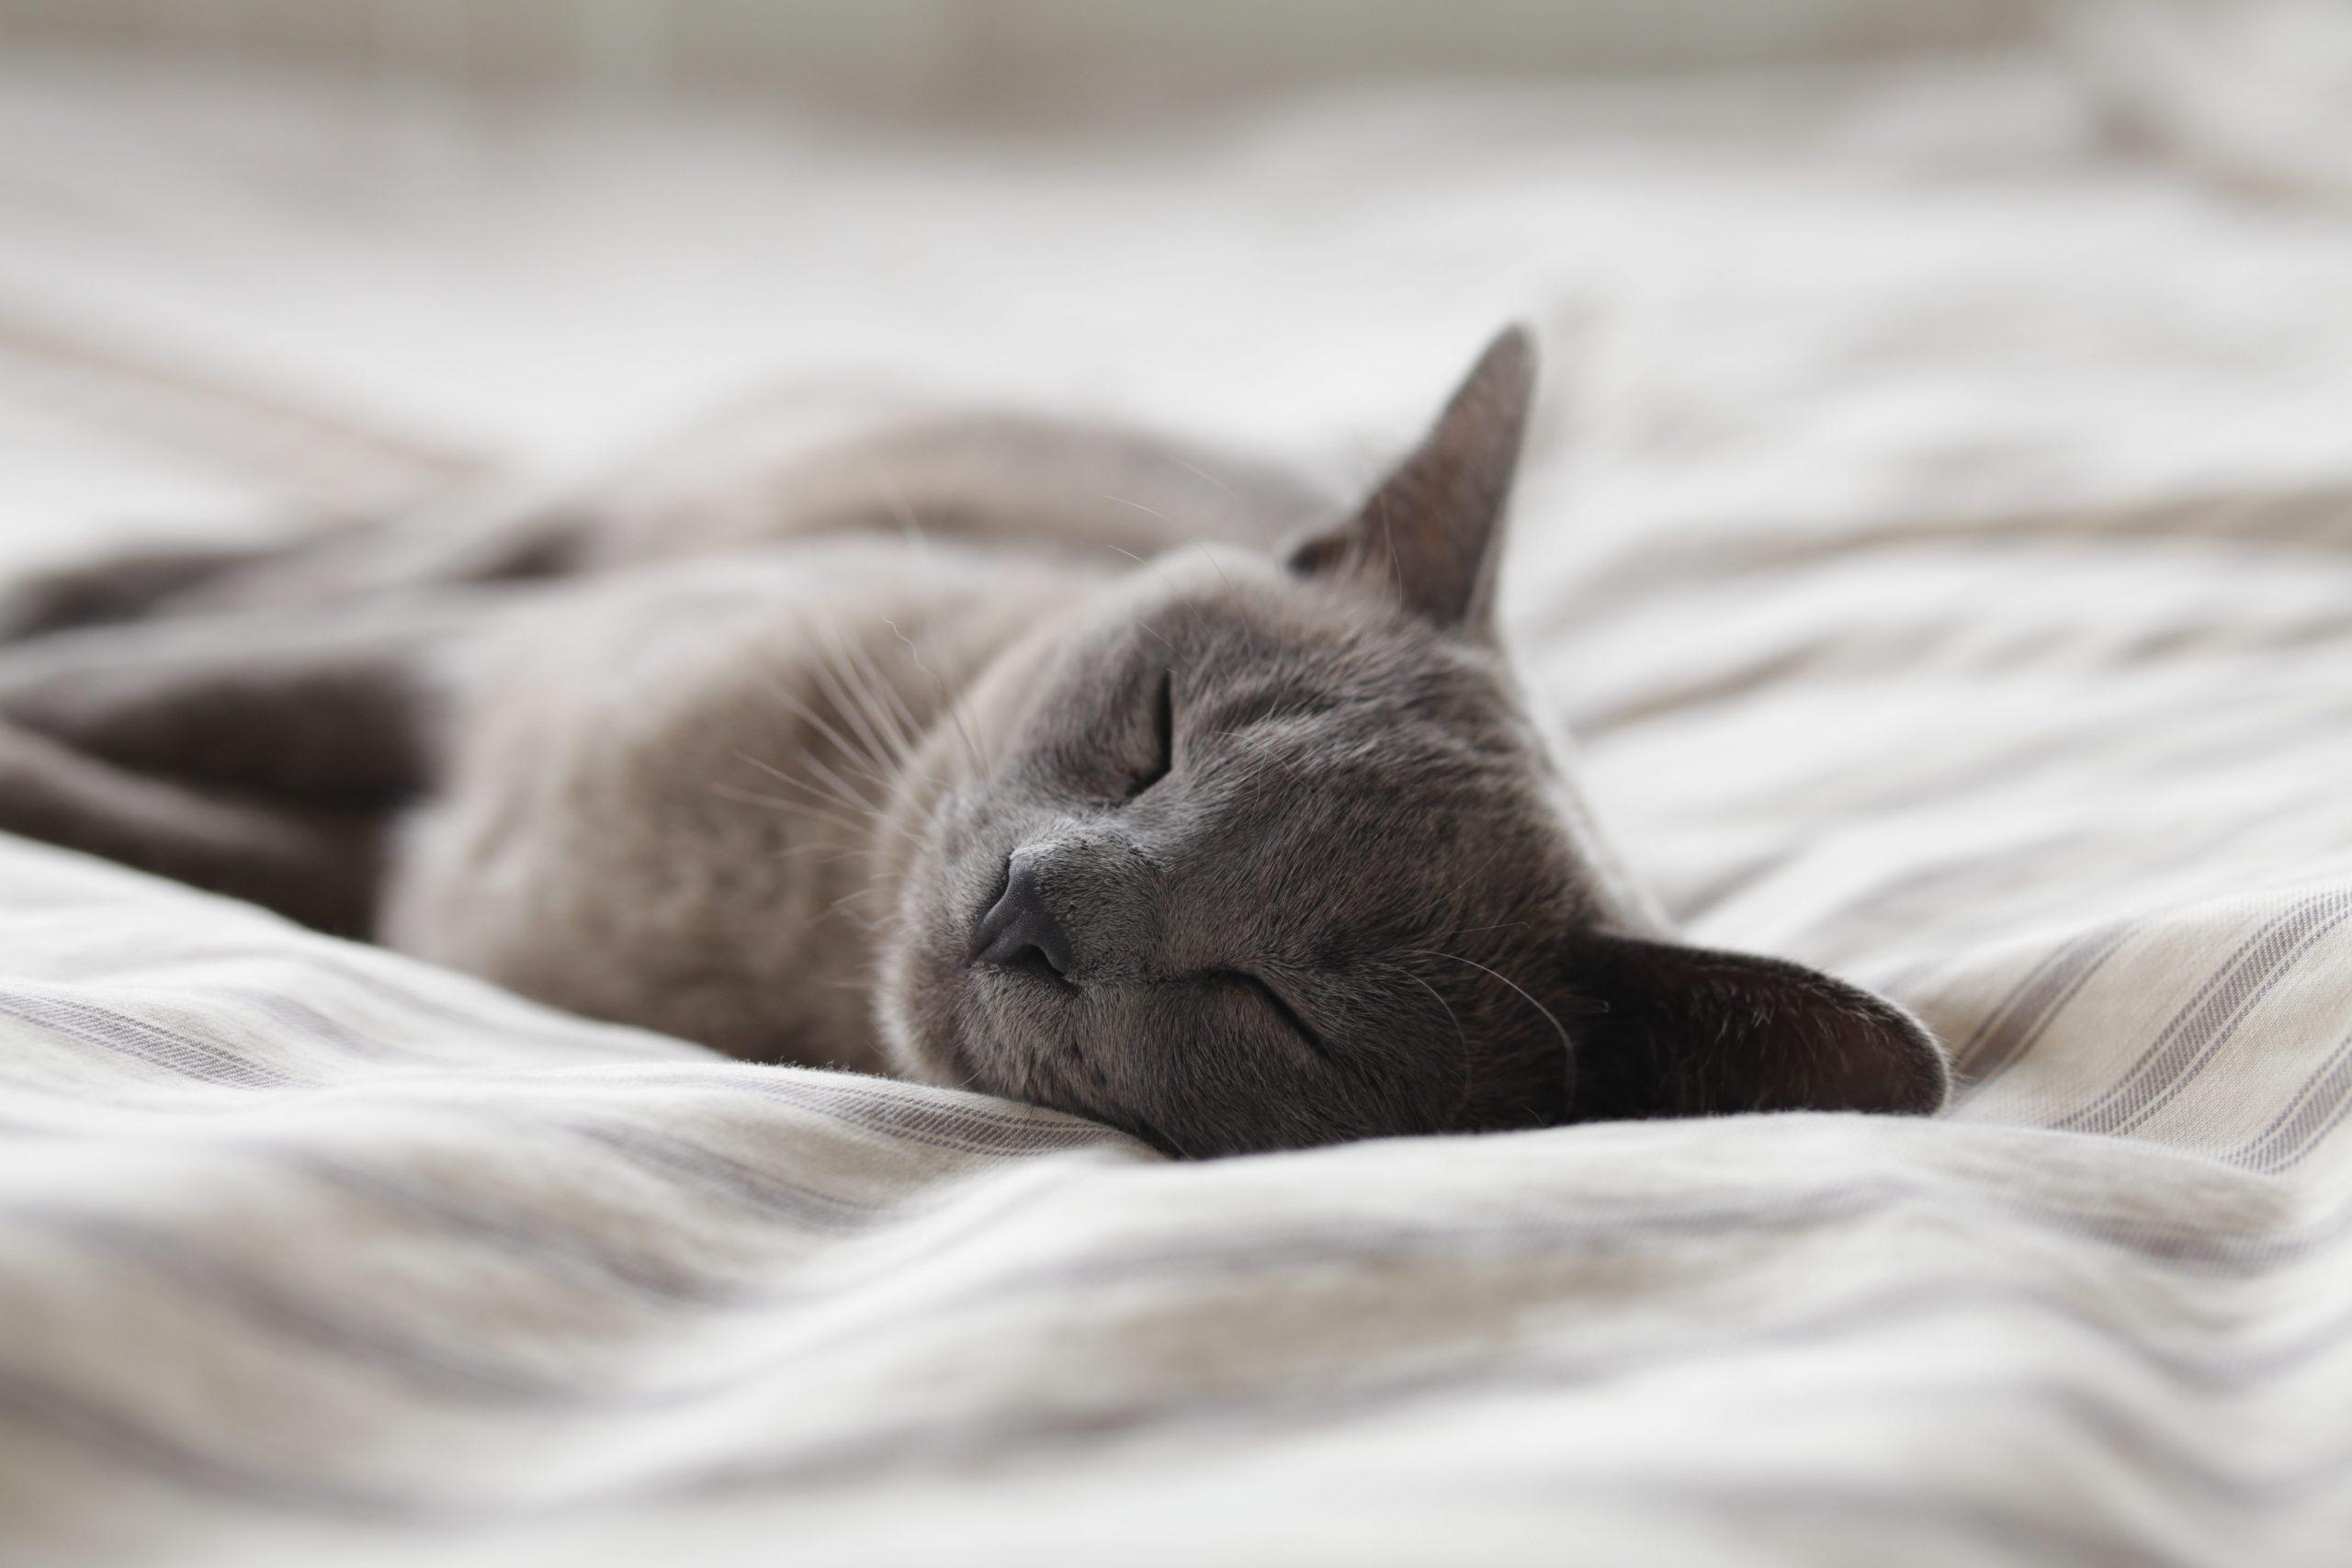 Effortless sleep